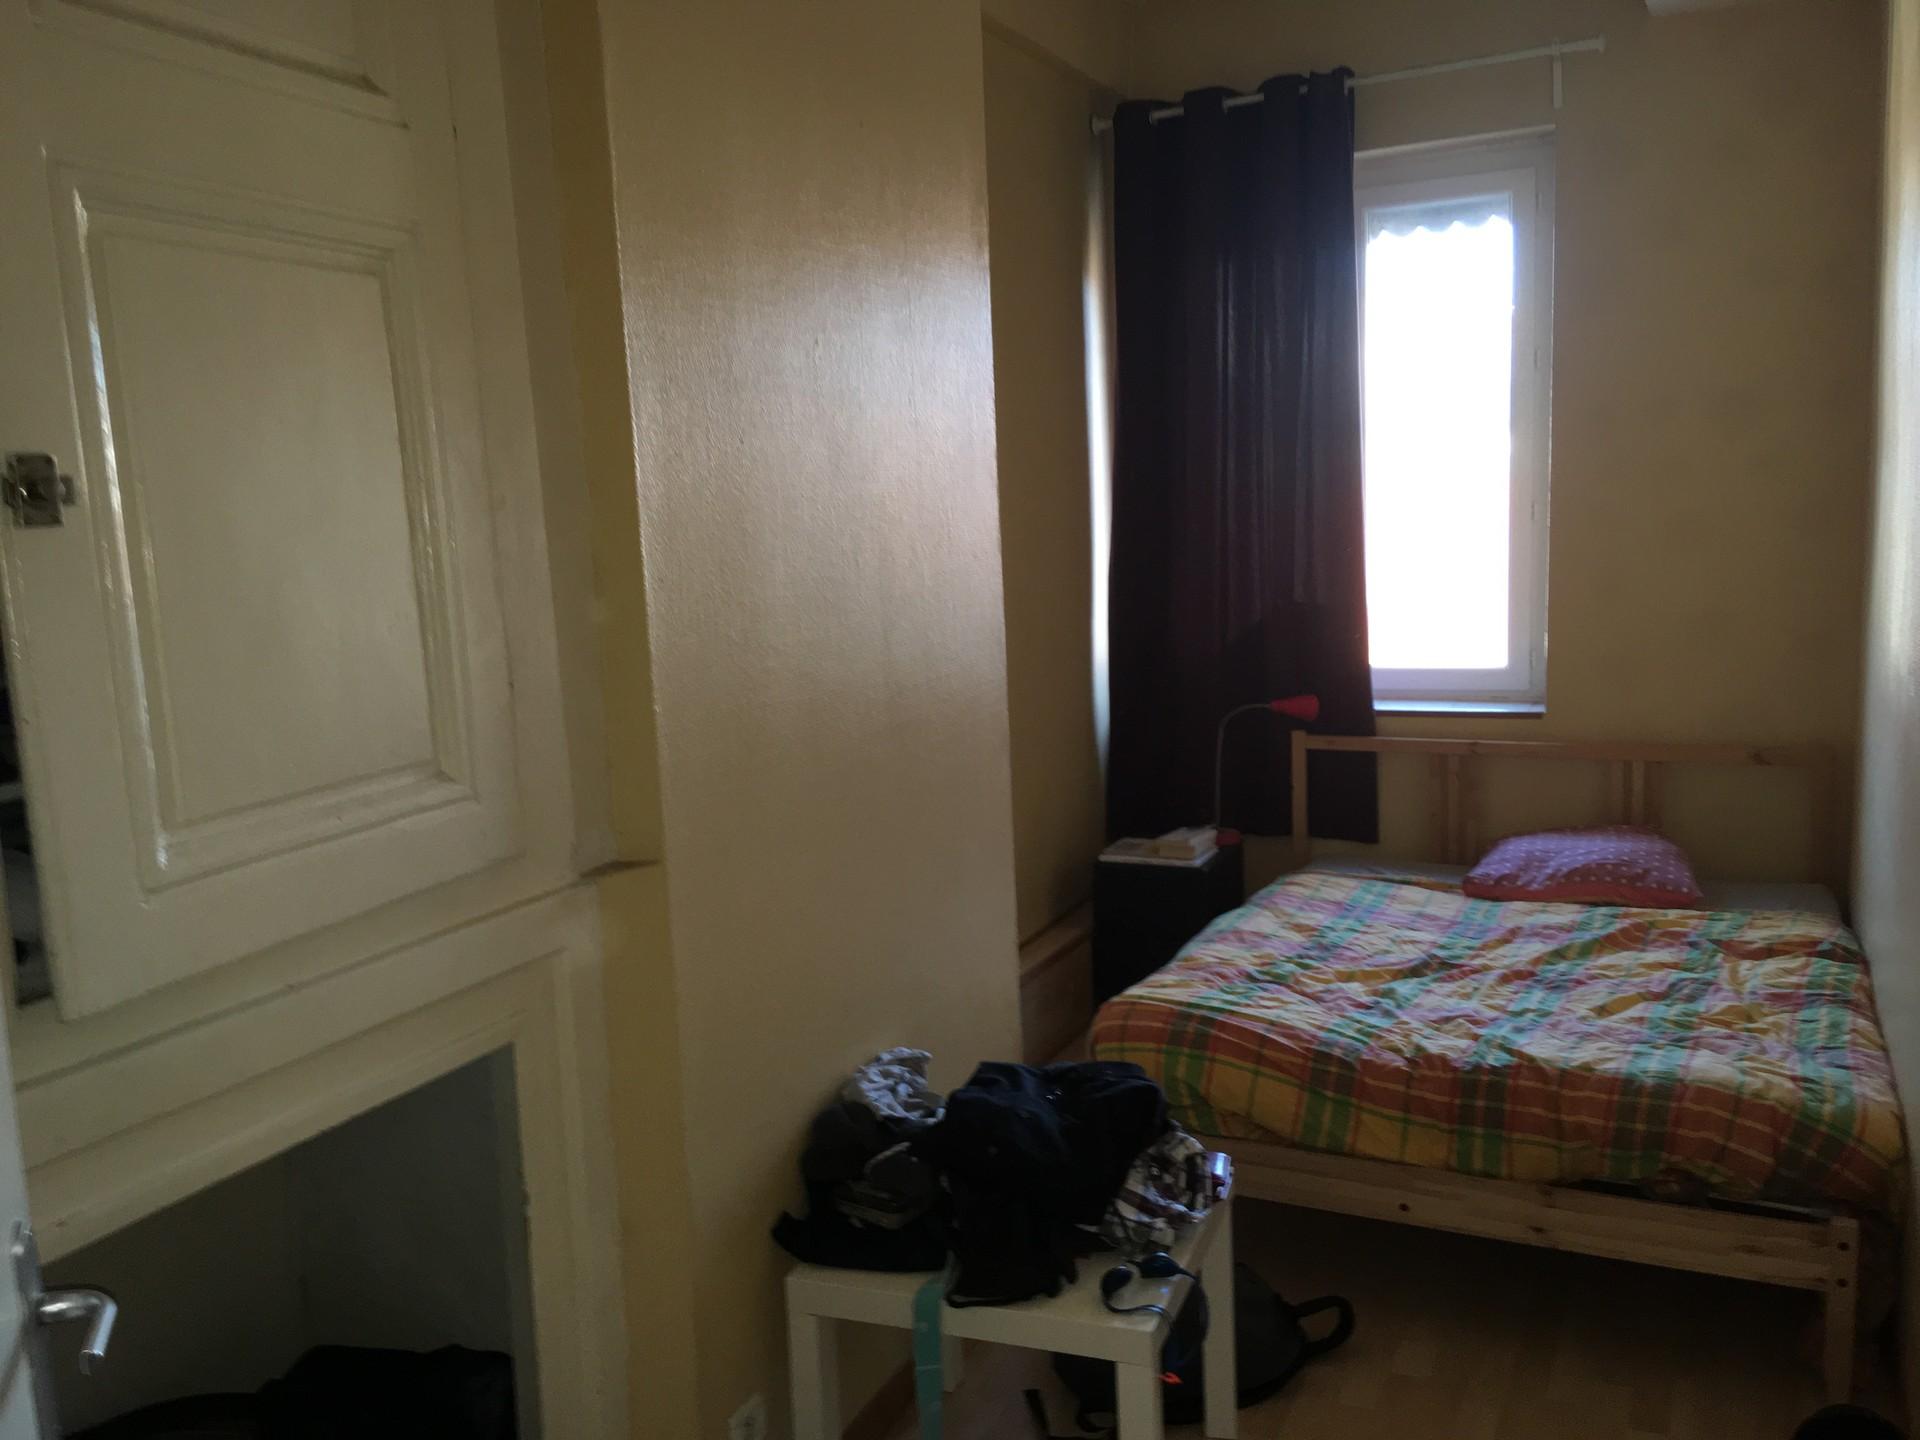 chambres-colocation-un-appartement-6eme-arrondissement-544f8755ec475f96cea6f1c8e05c8c2f